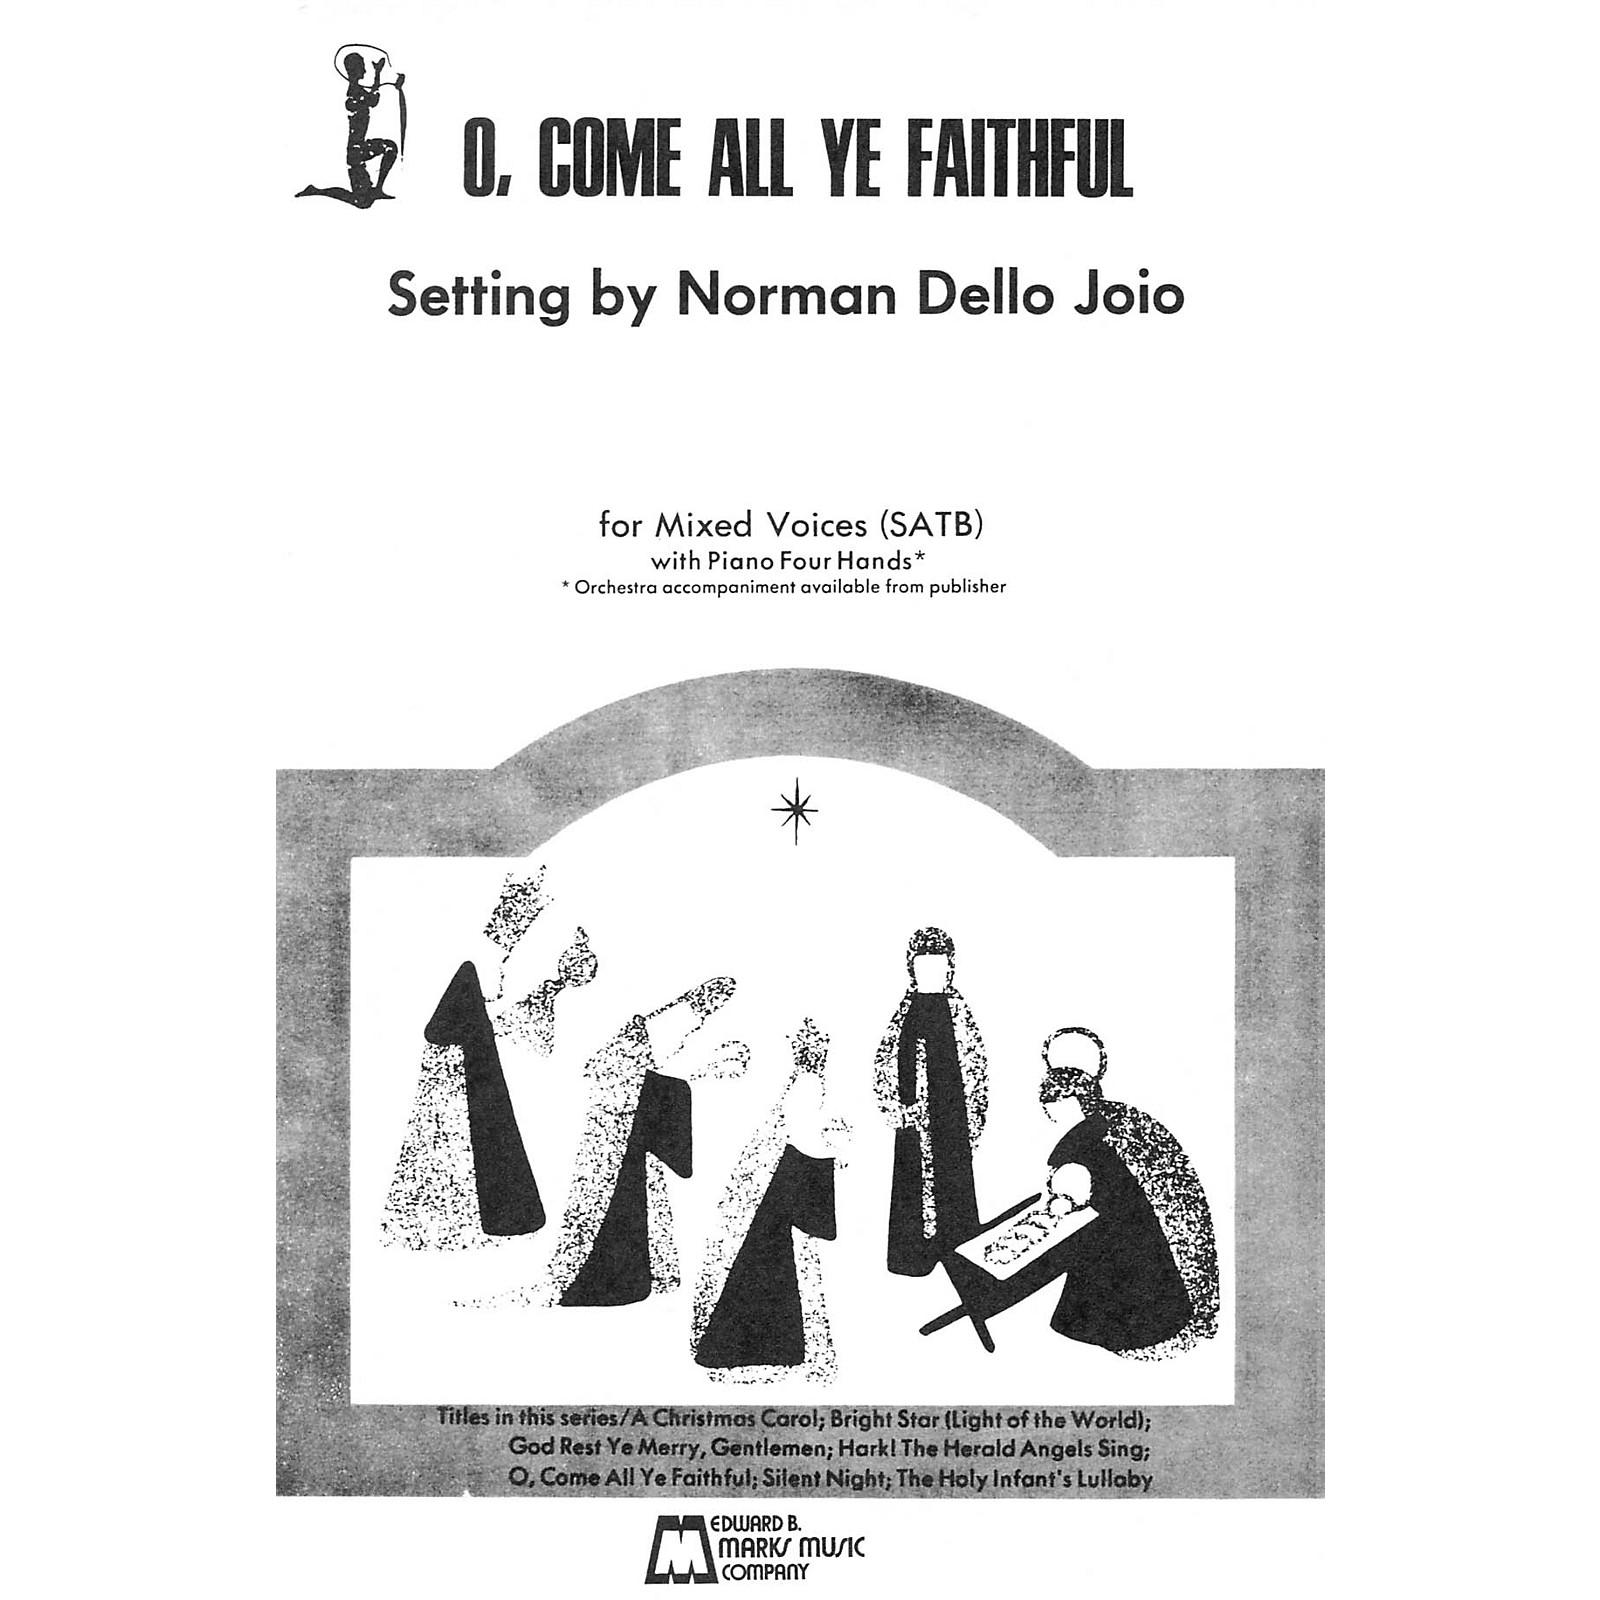 Edward B. Marks Music Company O Come All Ye Faithful (SATB, piano 4 hands)